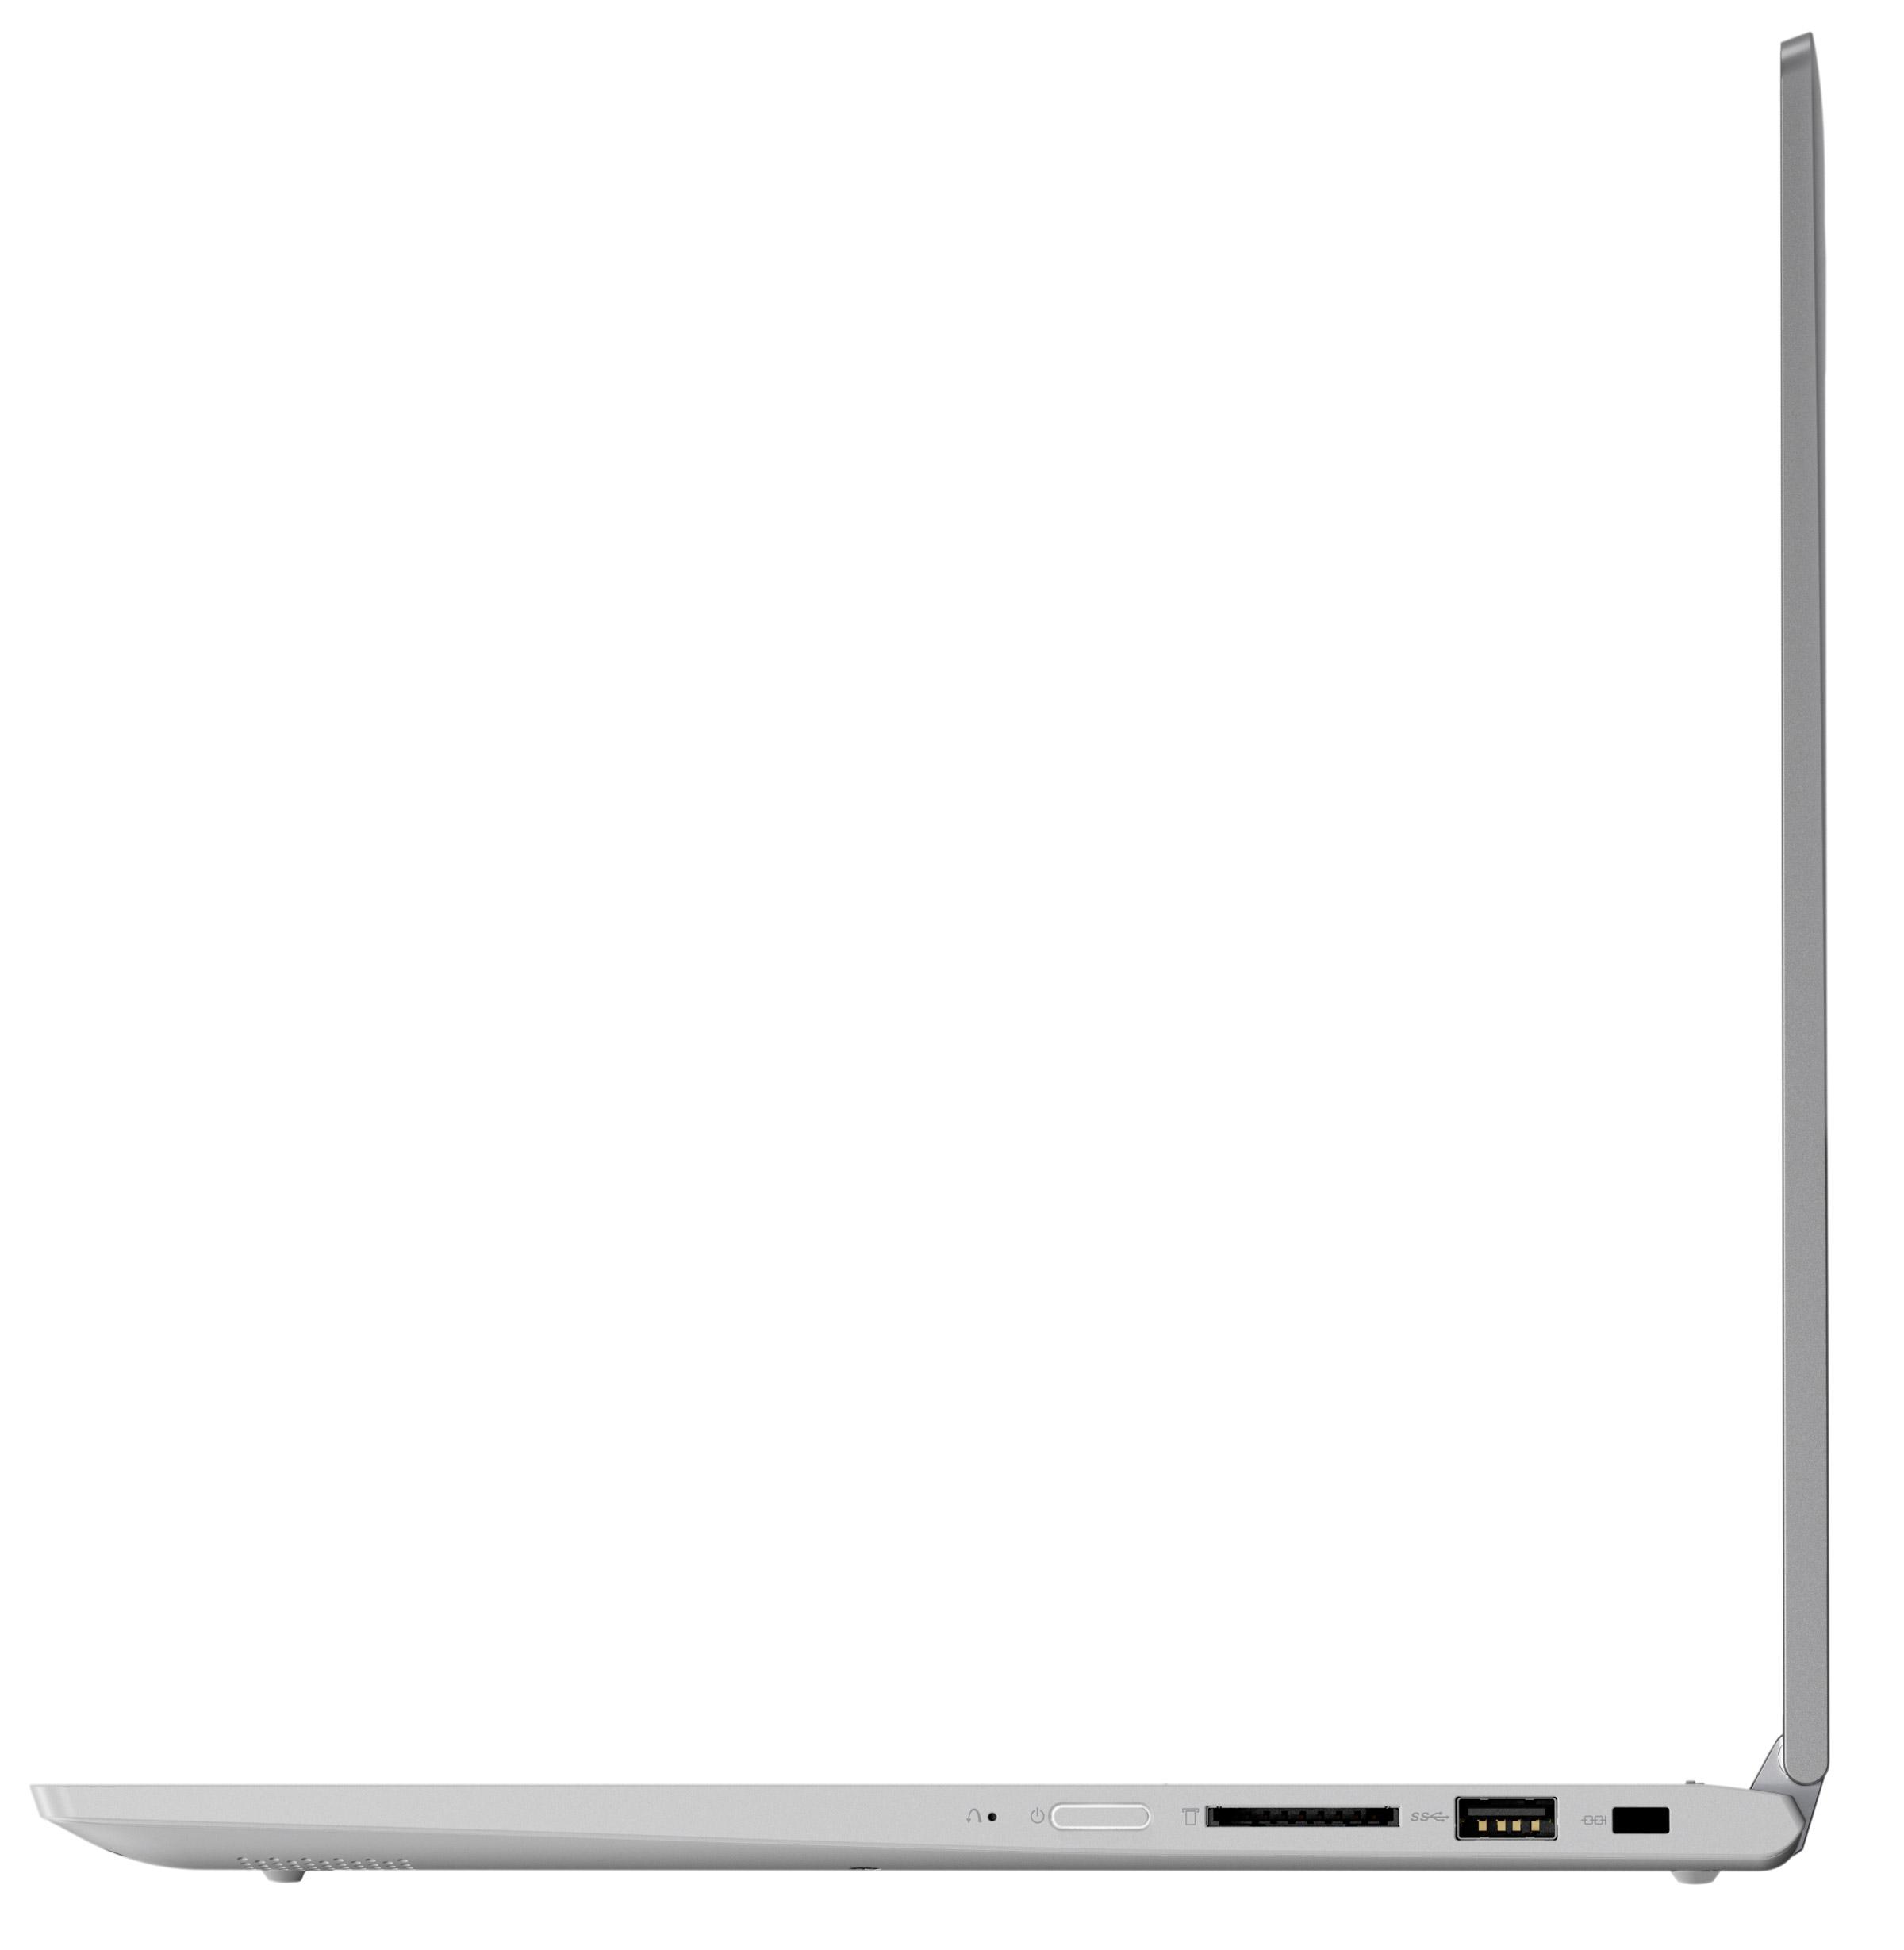 Фото  Ультрабук Lenovo Yoga 530-14IKB Mineral Grey (81EK016RRU)